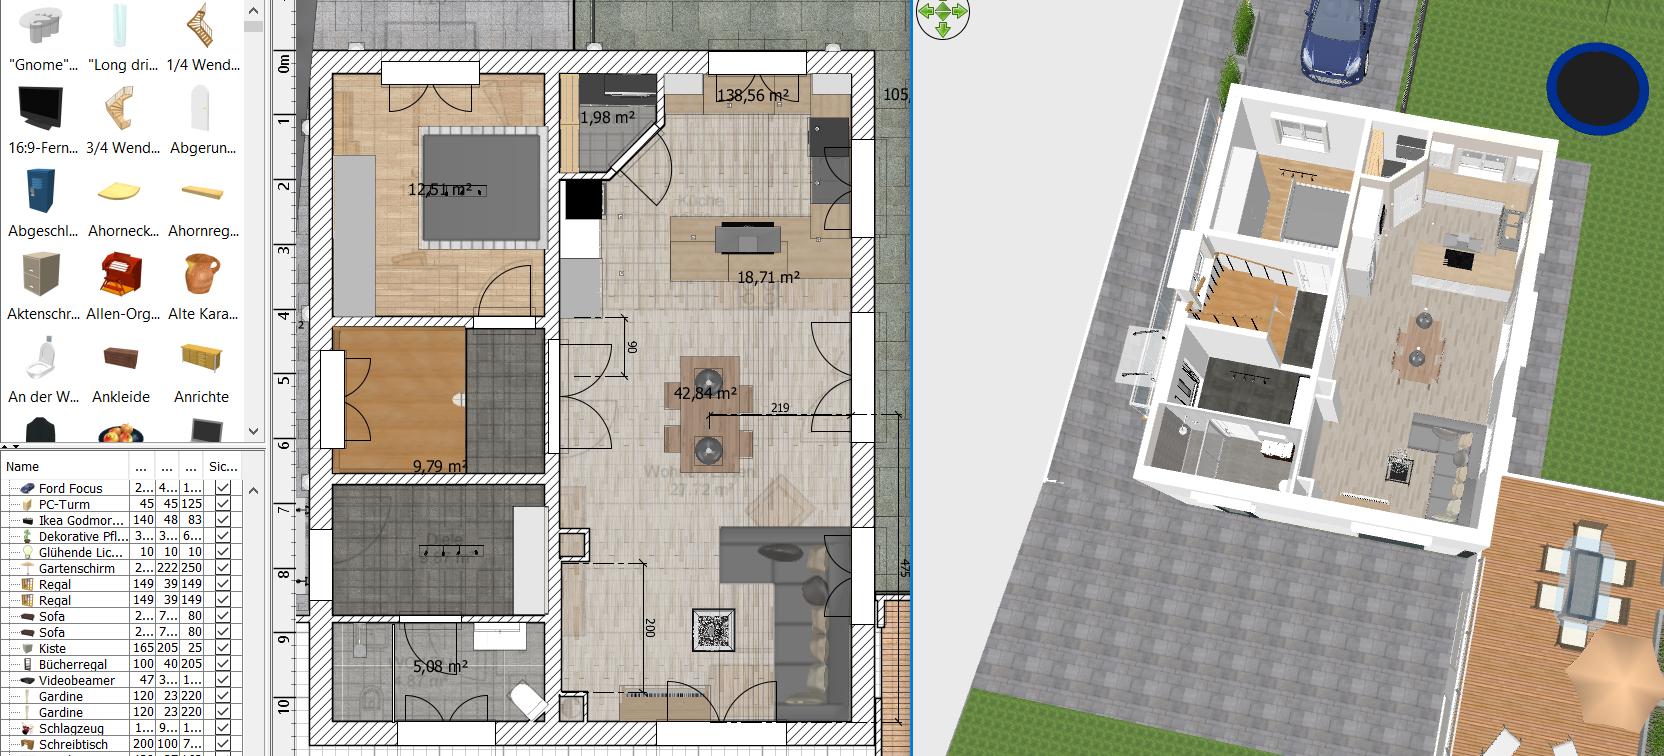 sweet home 3d anleitung f r einsteiger hausplanung in 3d. Black Bedroom Furniture Sets. Home Design Ideas